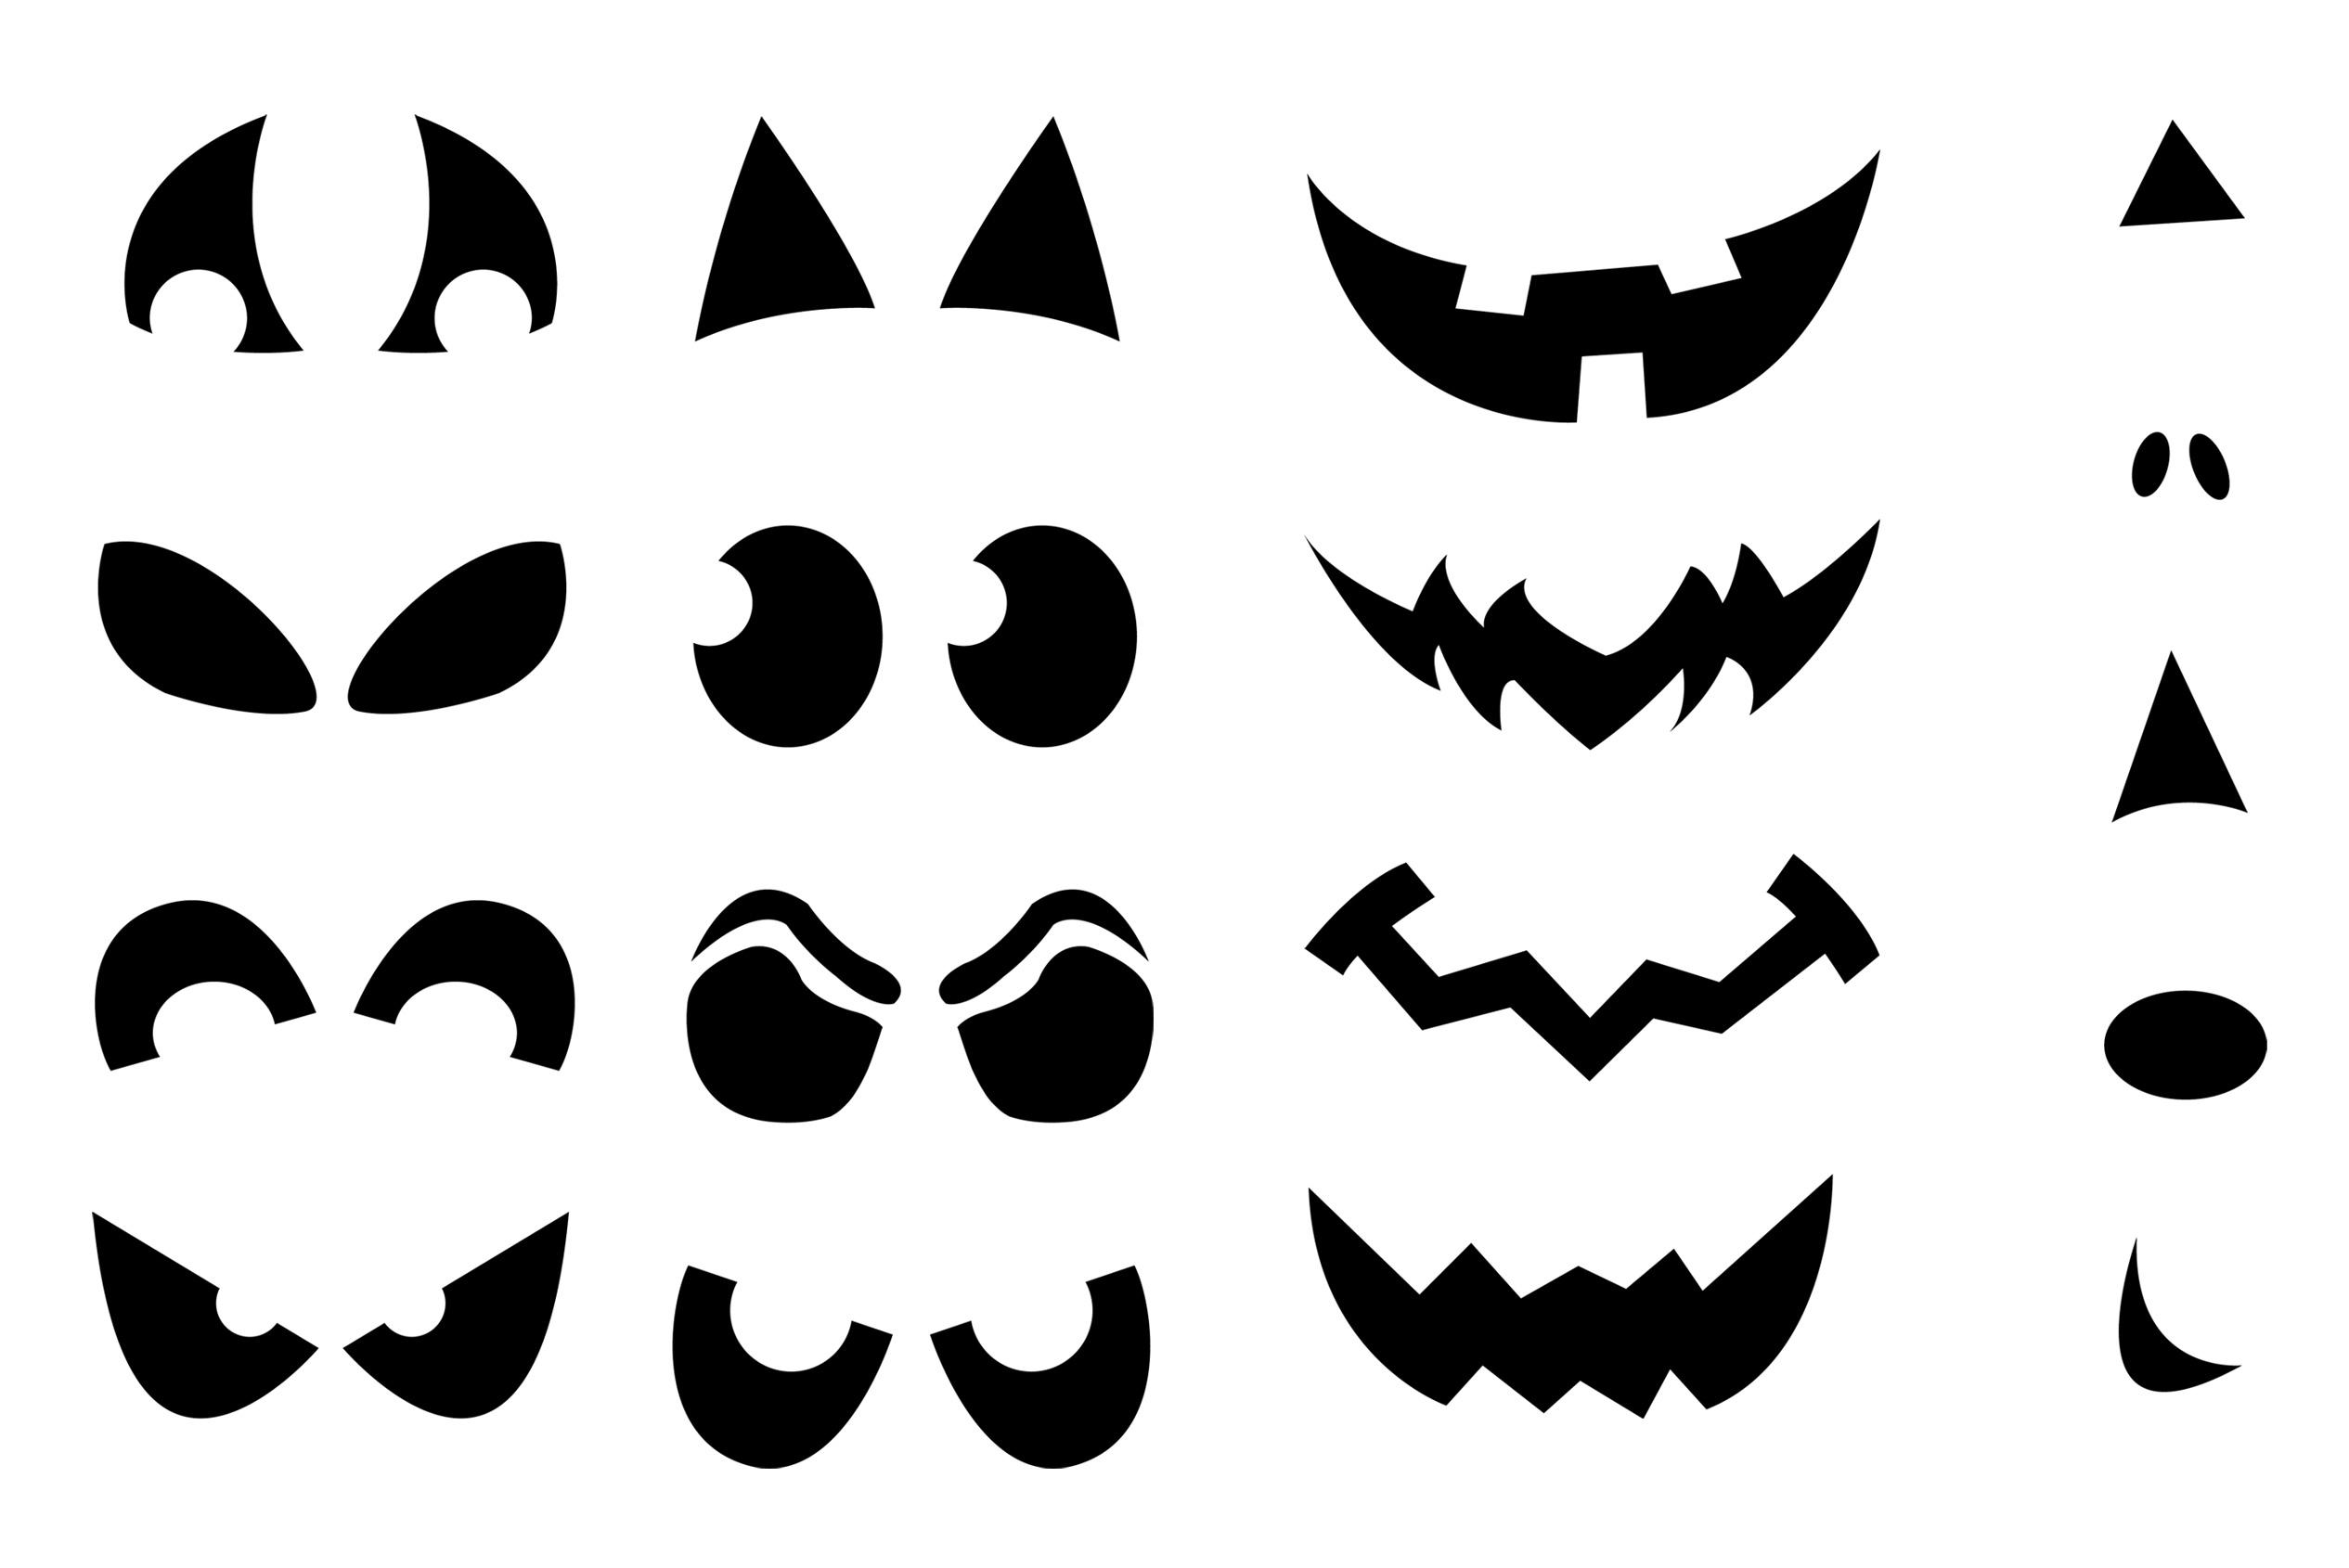 Jack-O'-Lantern Shirt Stencils | Craft Buds - Free Printable Pumpkin Faces